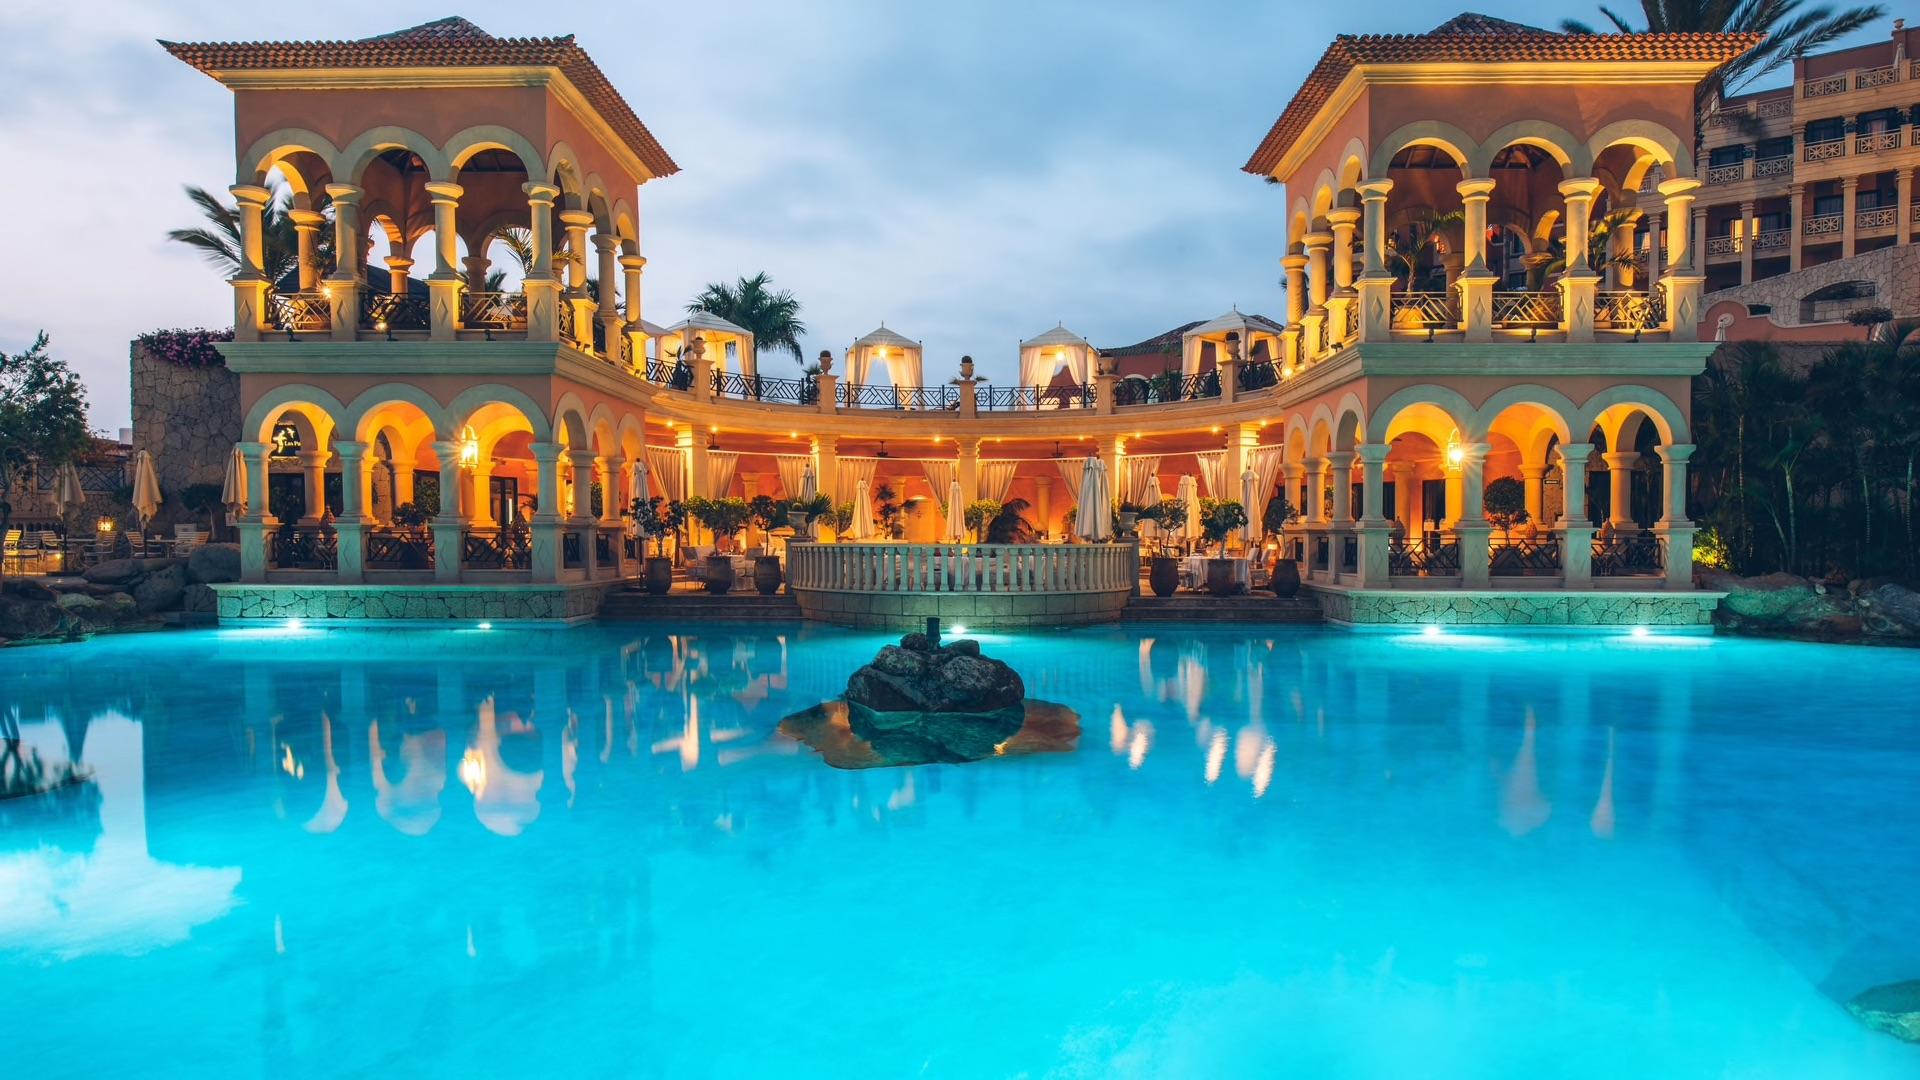 Hotel Iberostar Grand El Mirador – Costa Adeje